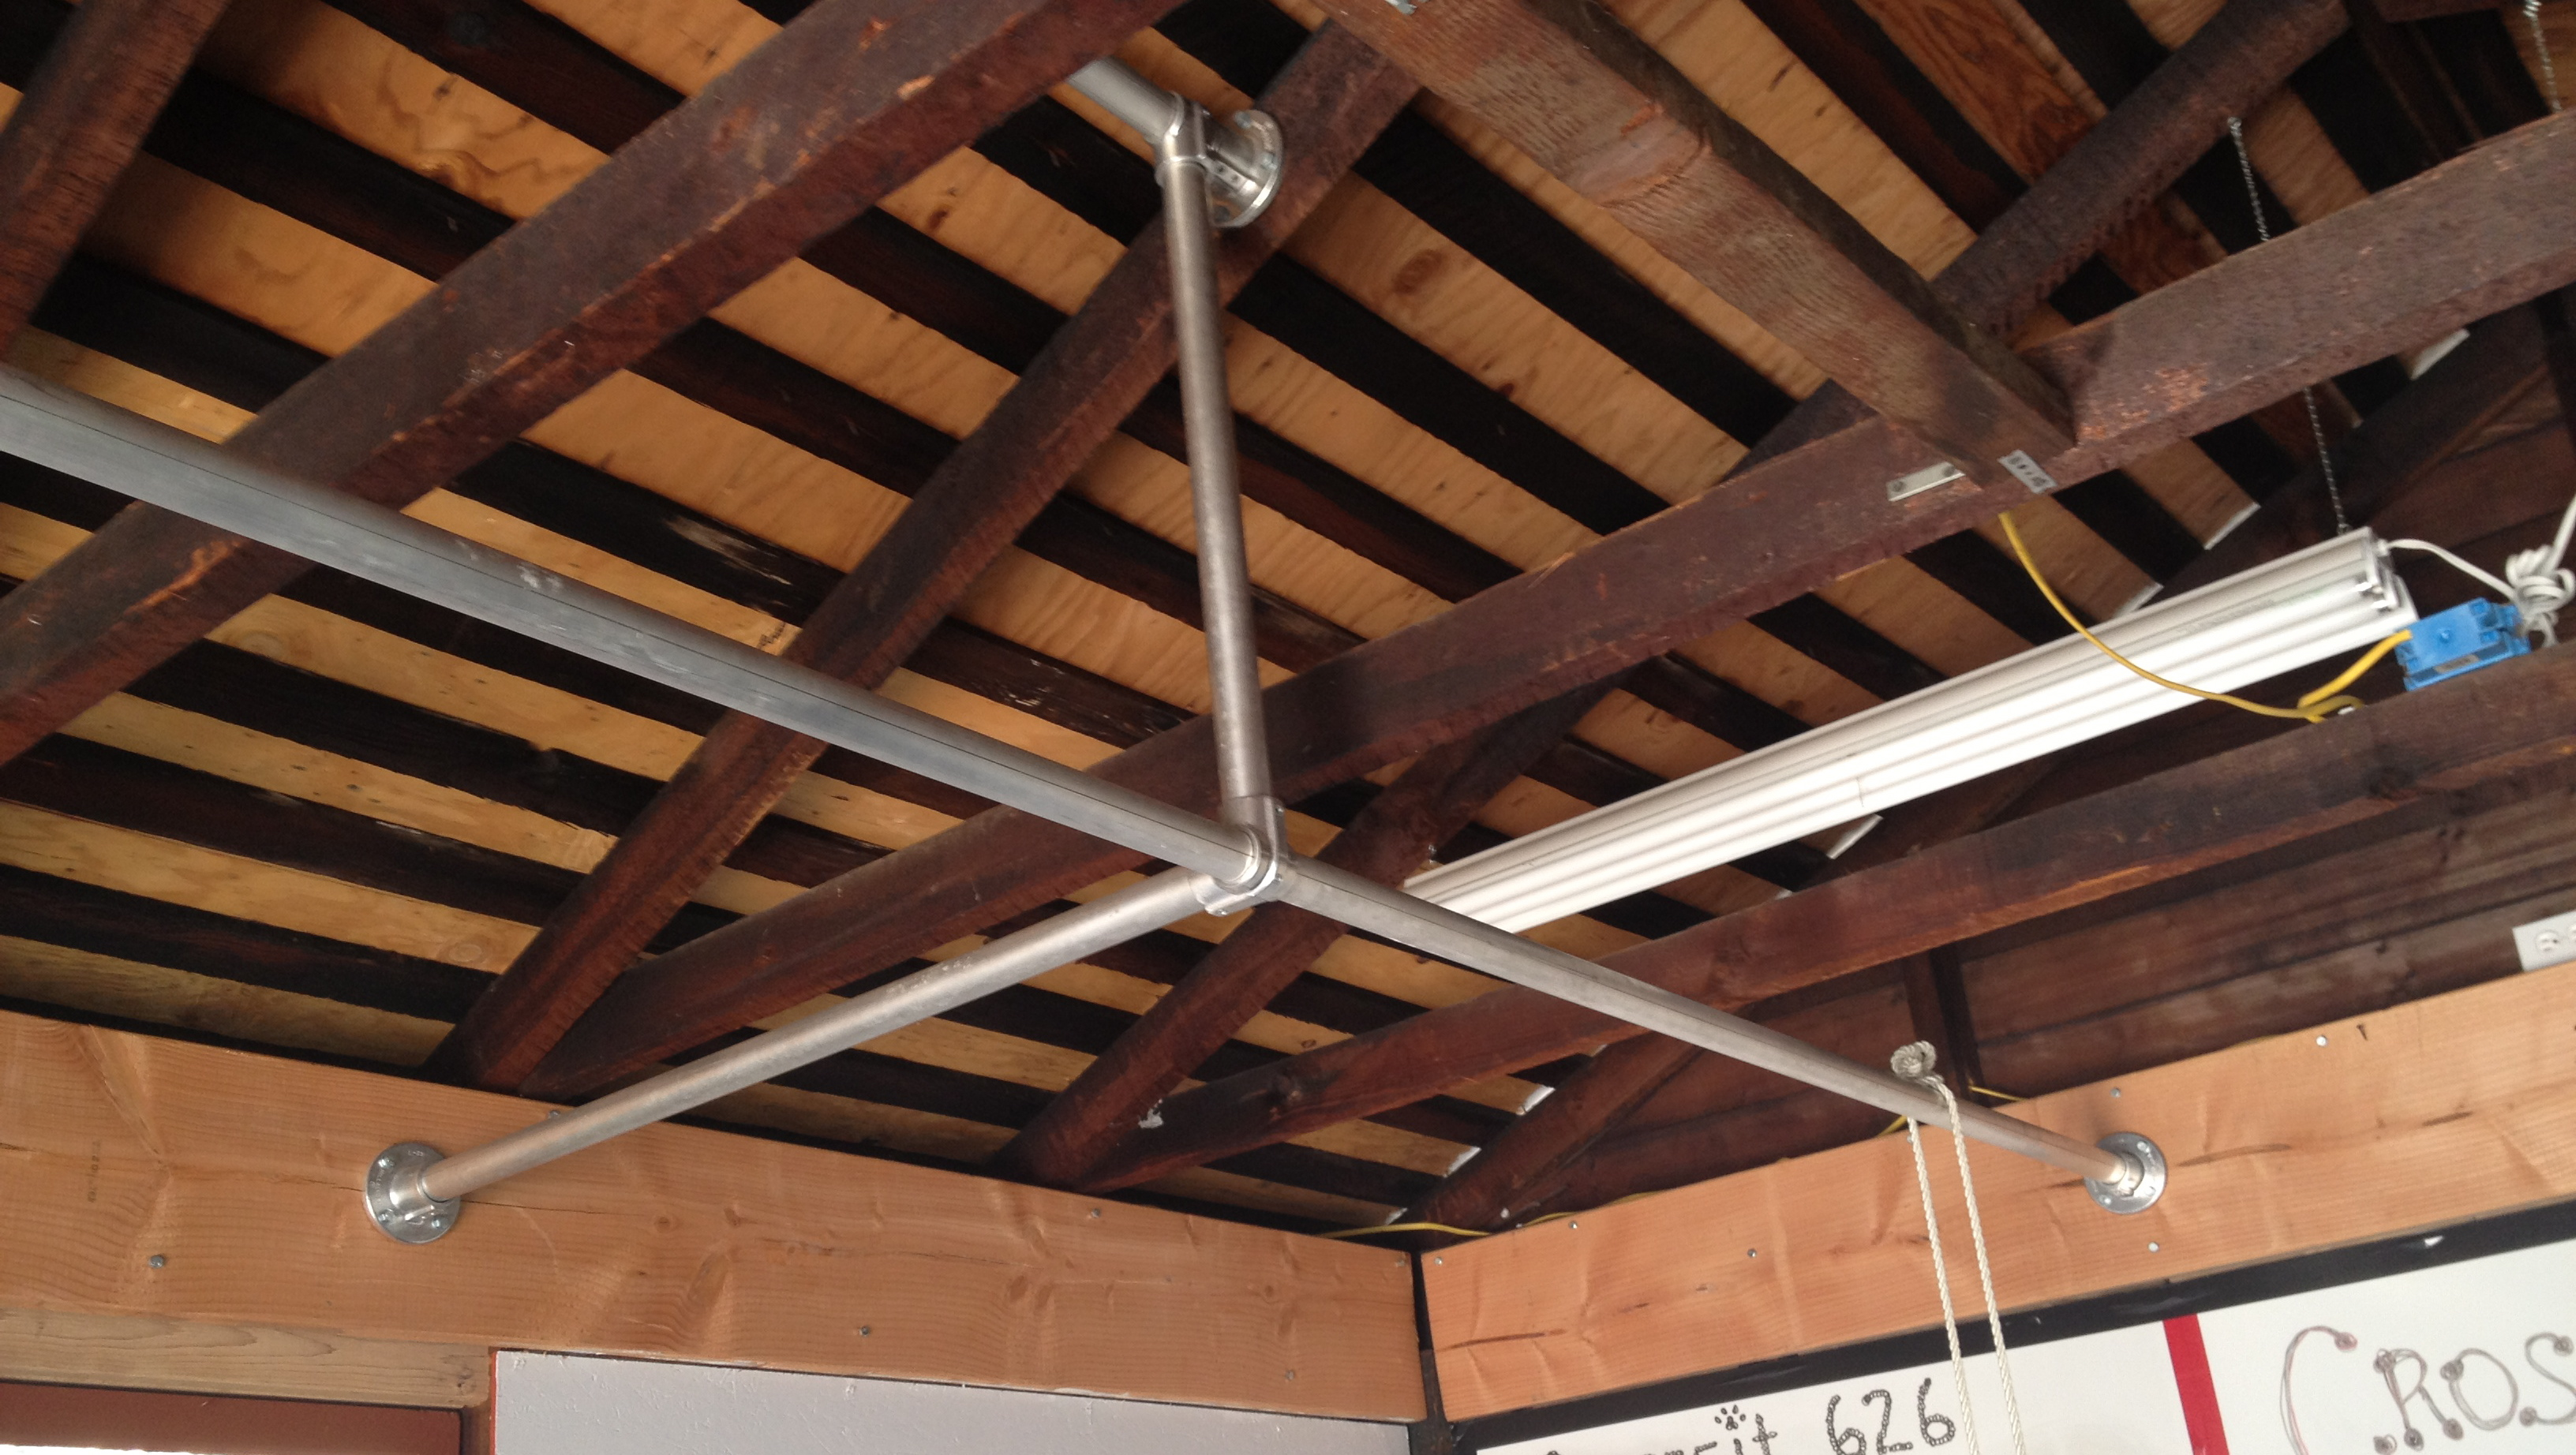 ... build out of the original CrossFit 626 garage bar. homemade crossfit rig